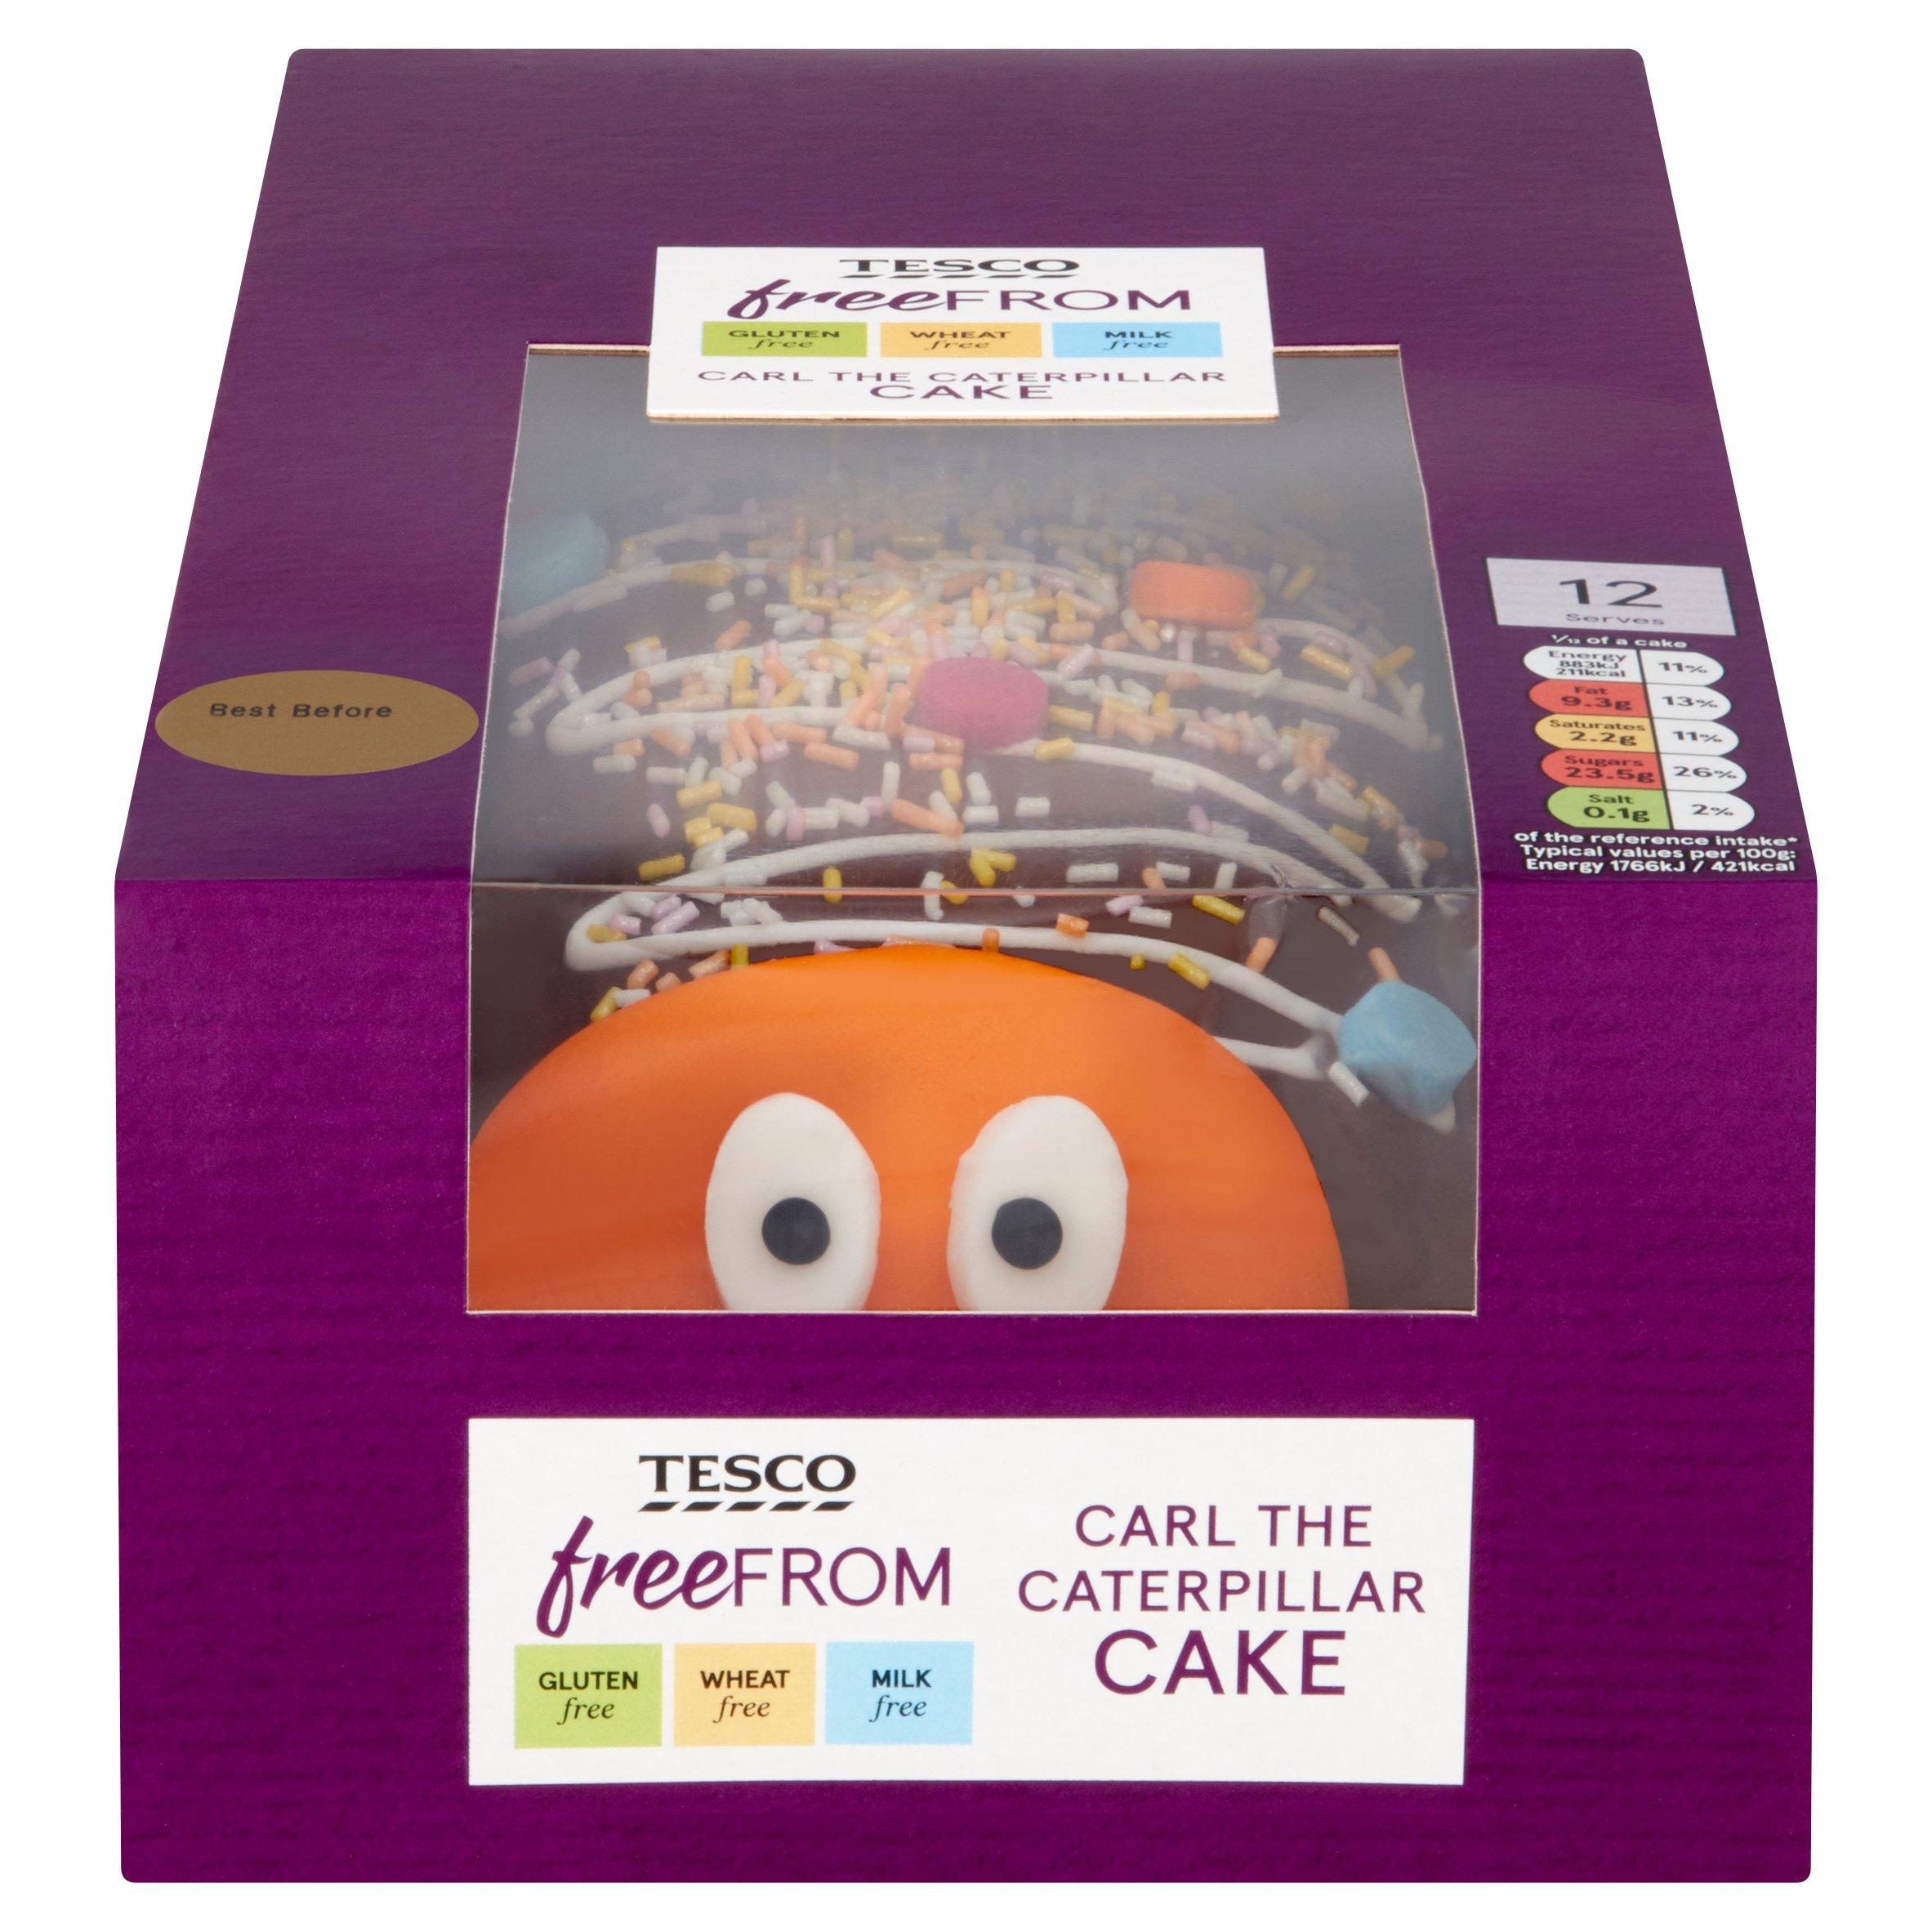 Tesco Free From Carl The Caterpillar Cake